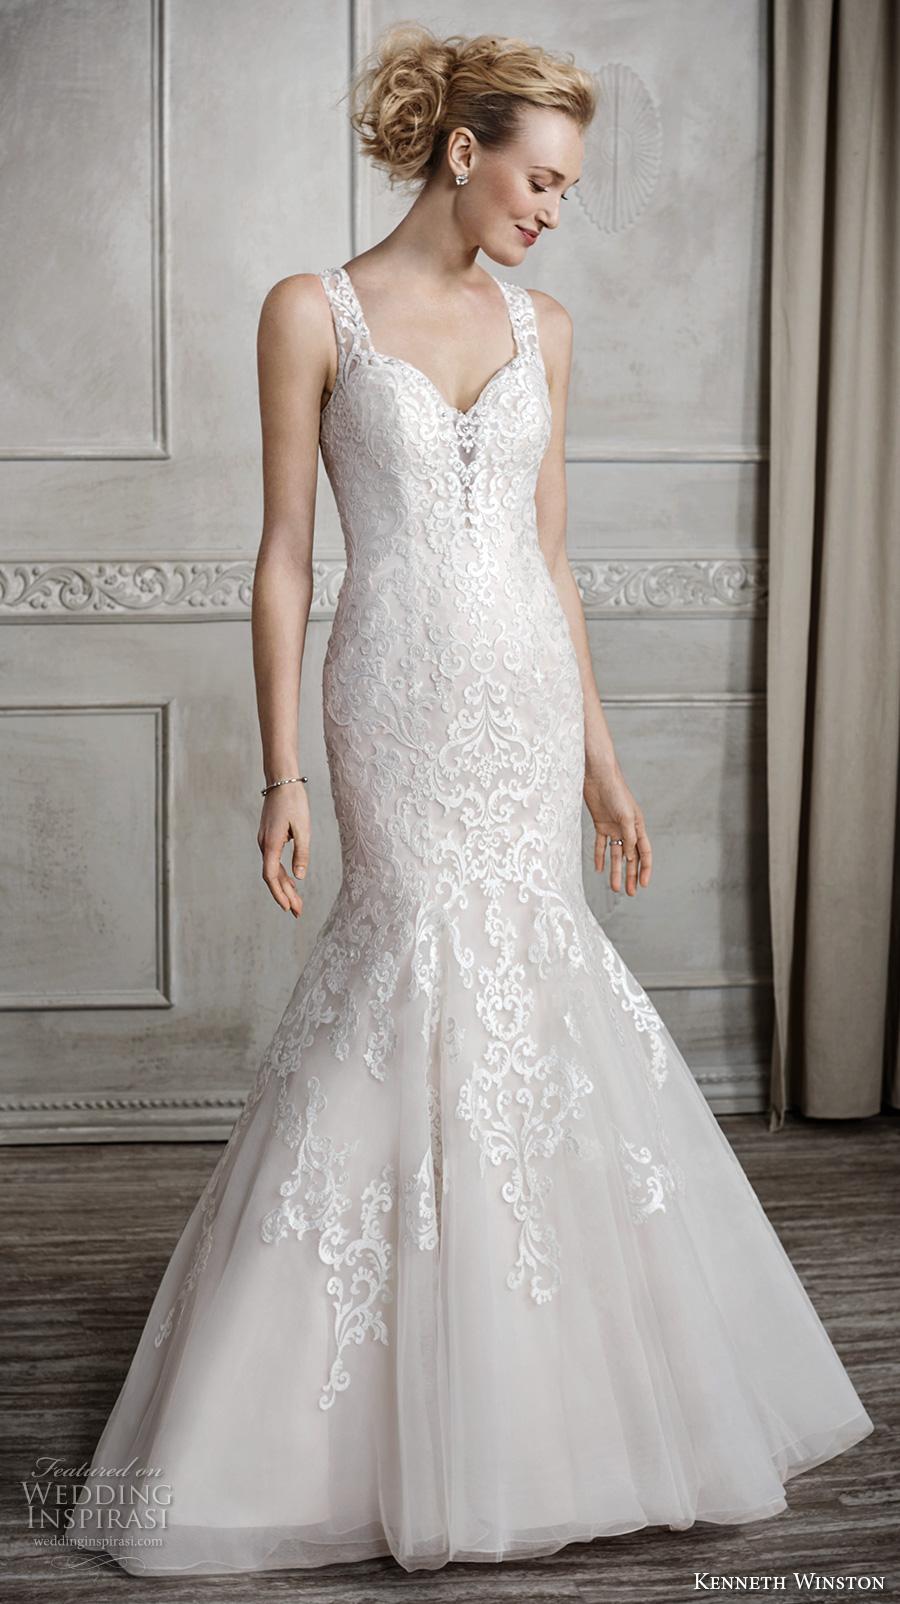 Kenneth winston fall 2016 wedding dresses wedding inspirasi for Illusion sweetheart neckline wedding dress